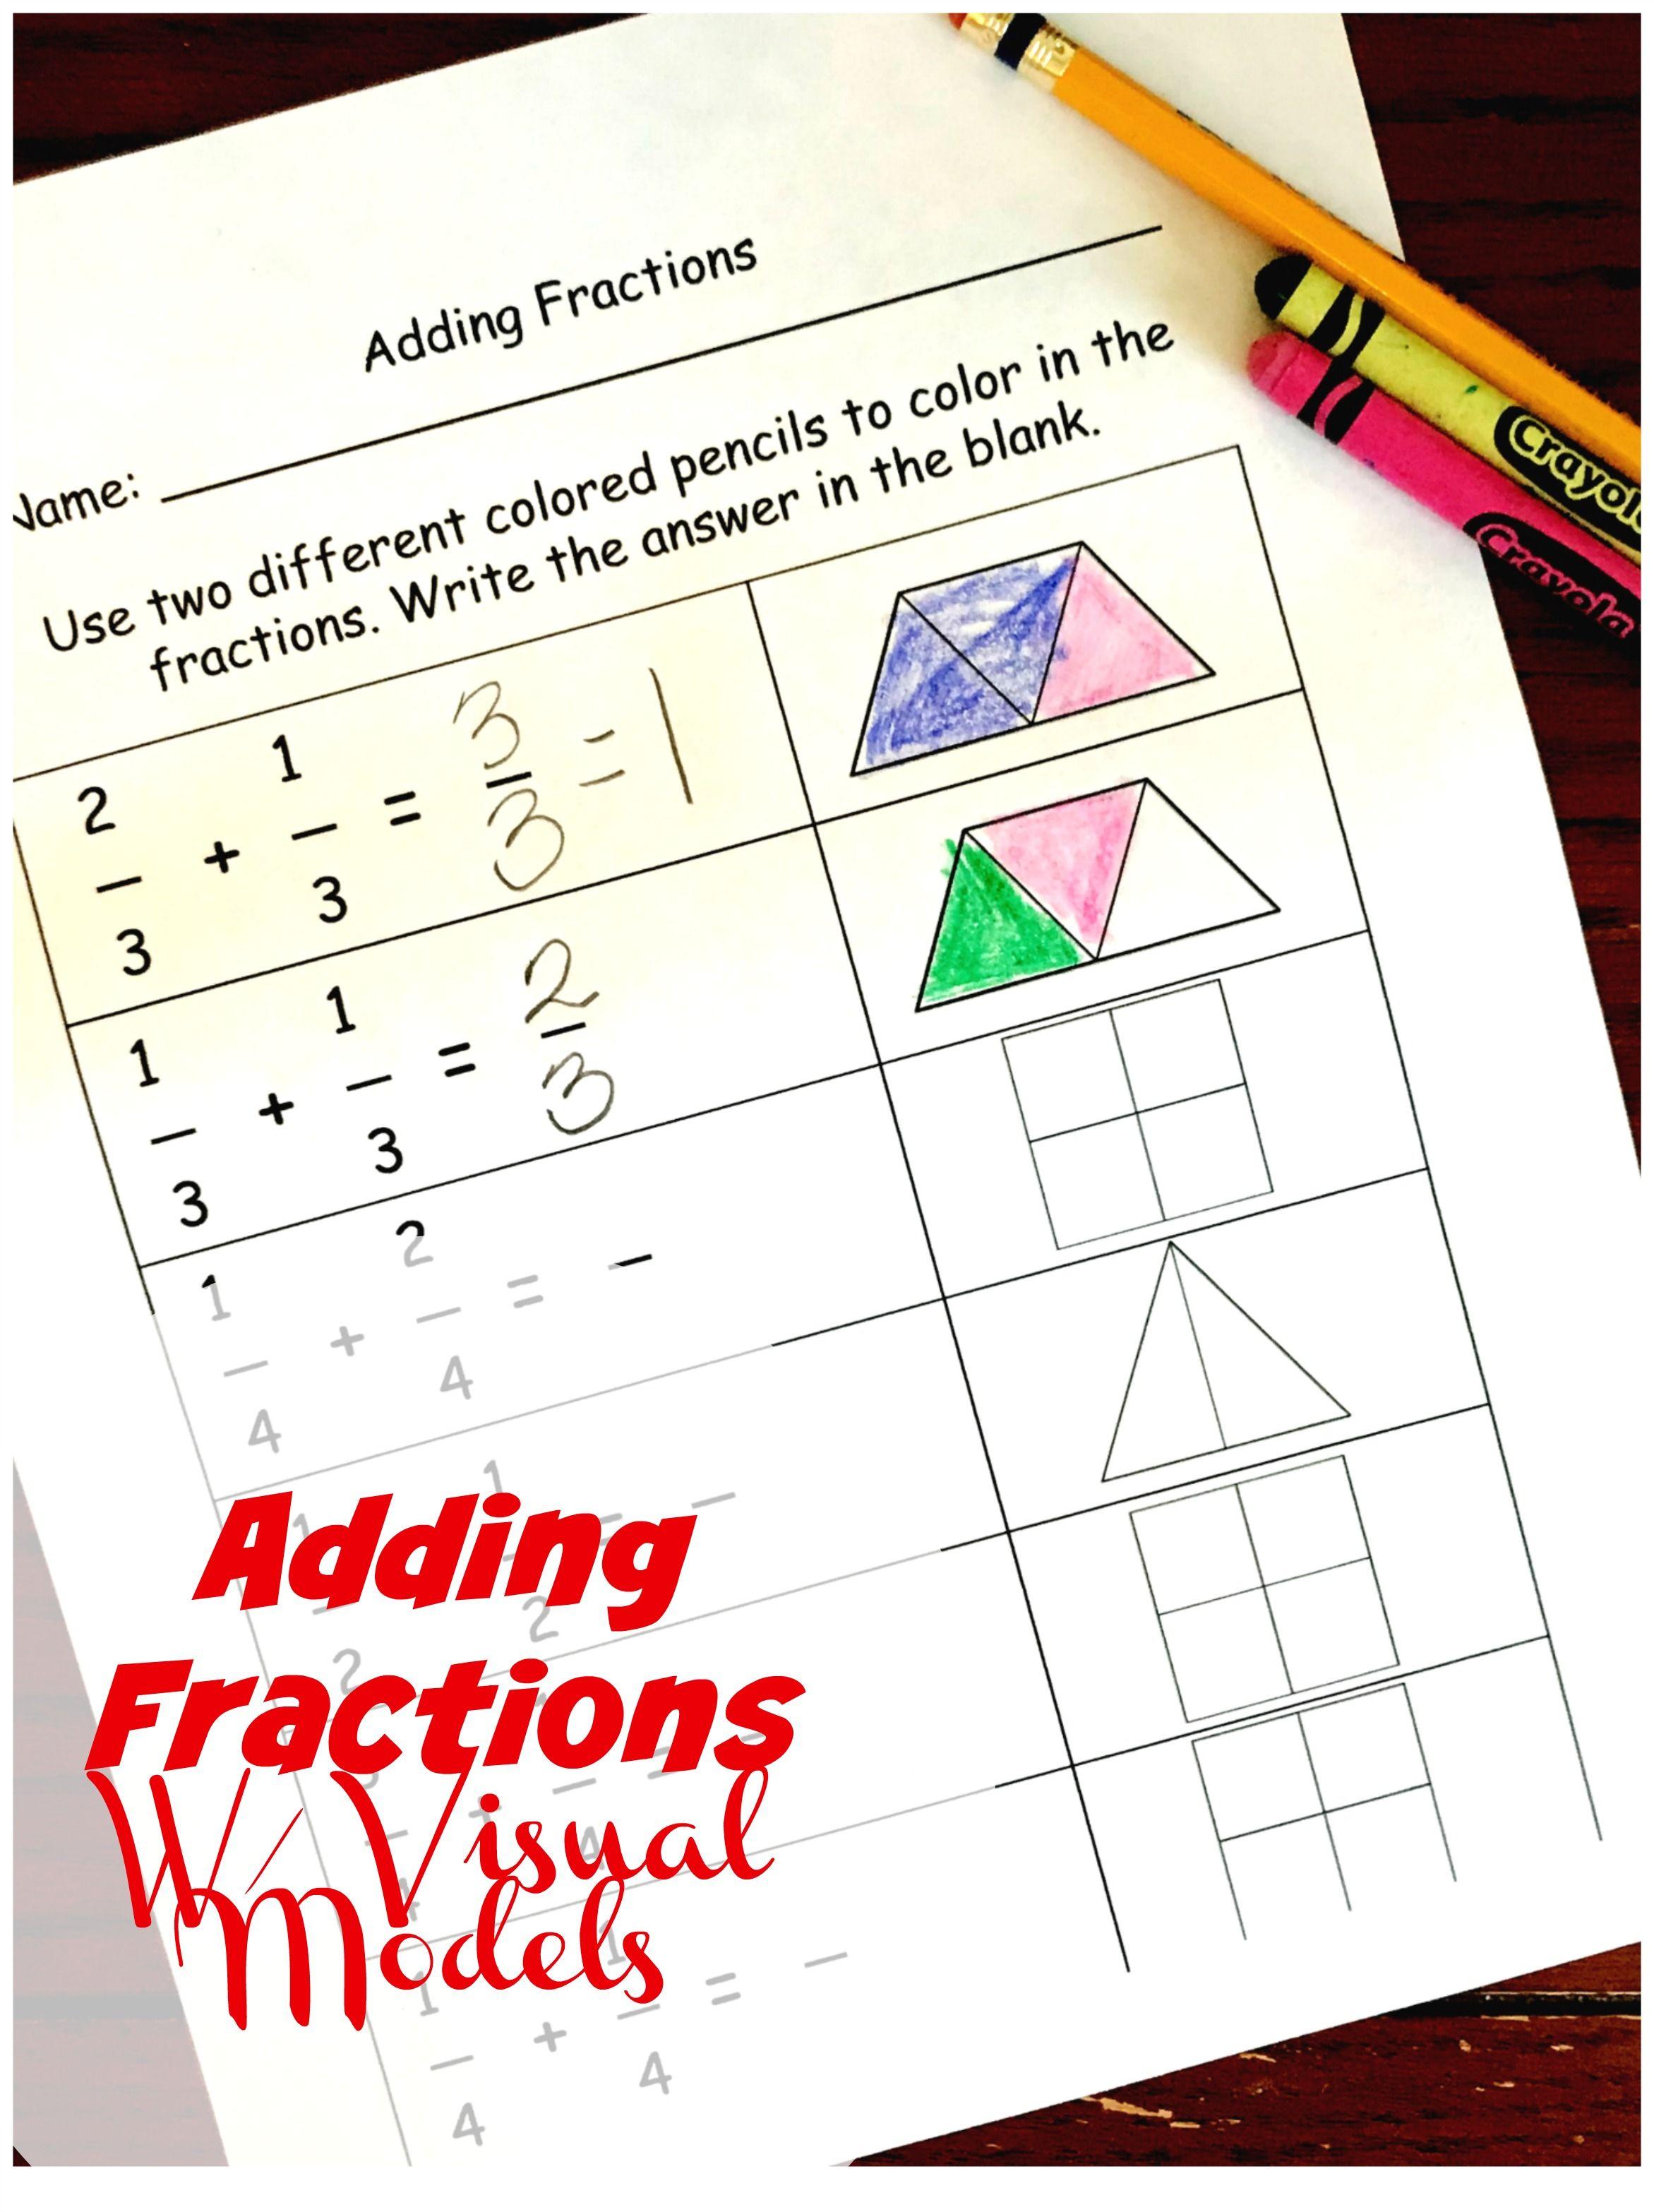 Adding Fractions Using Visual Models Worksheet